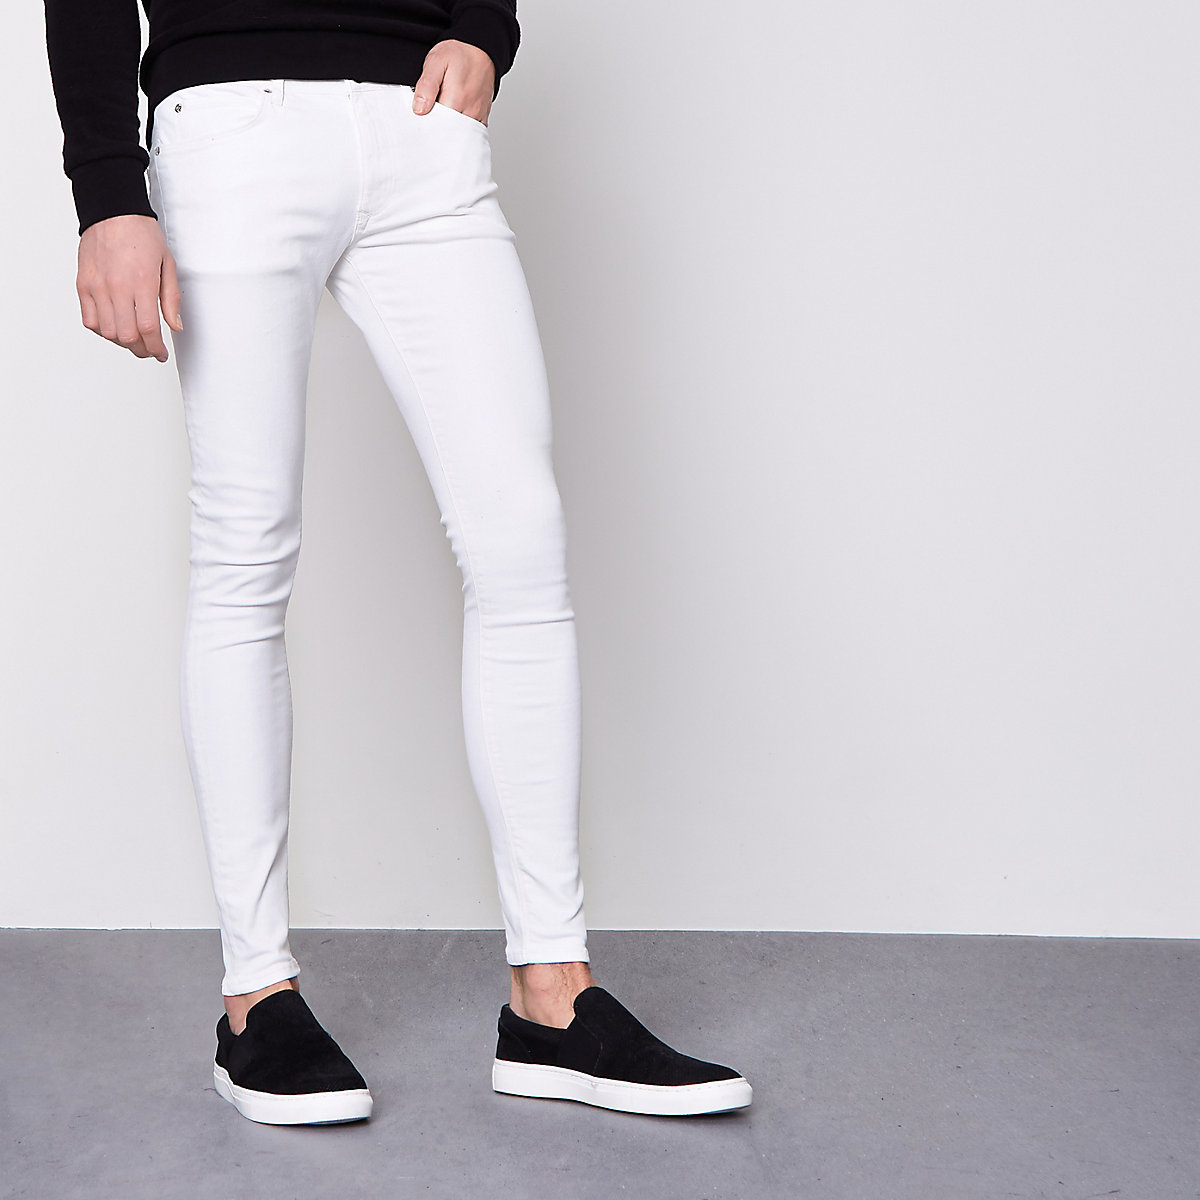 Ollie - Witte superskinny spray on jeans